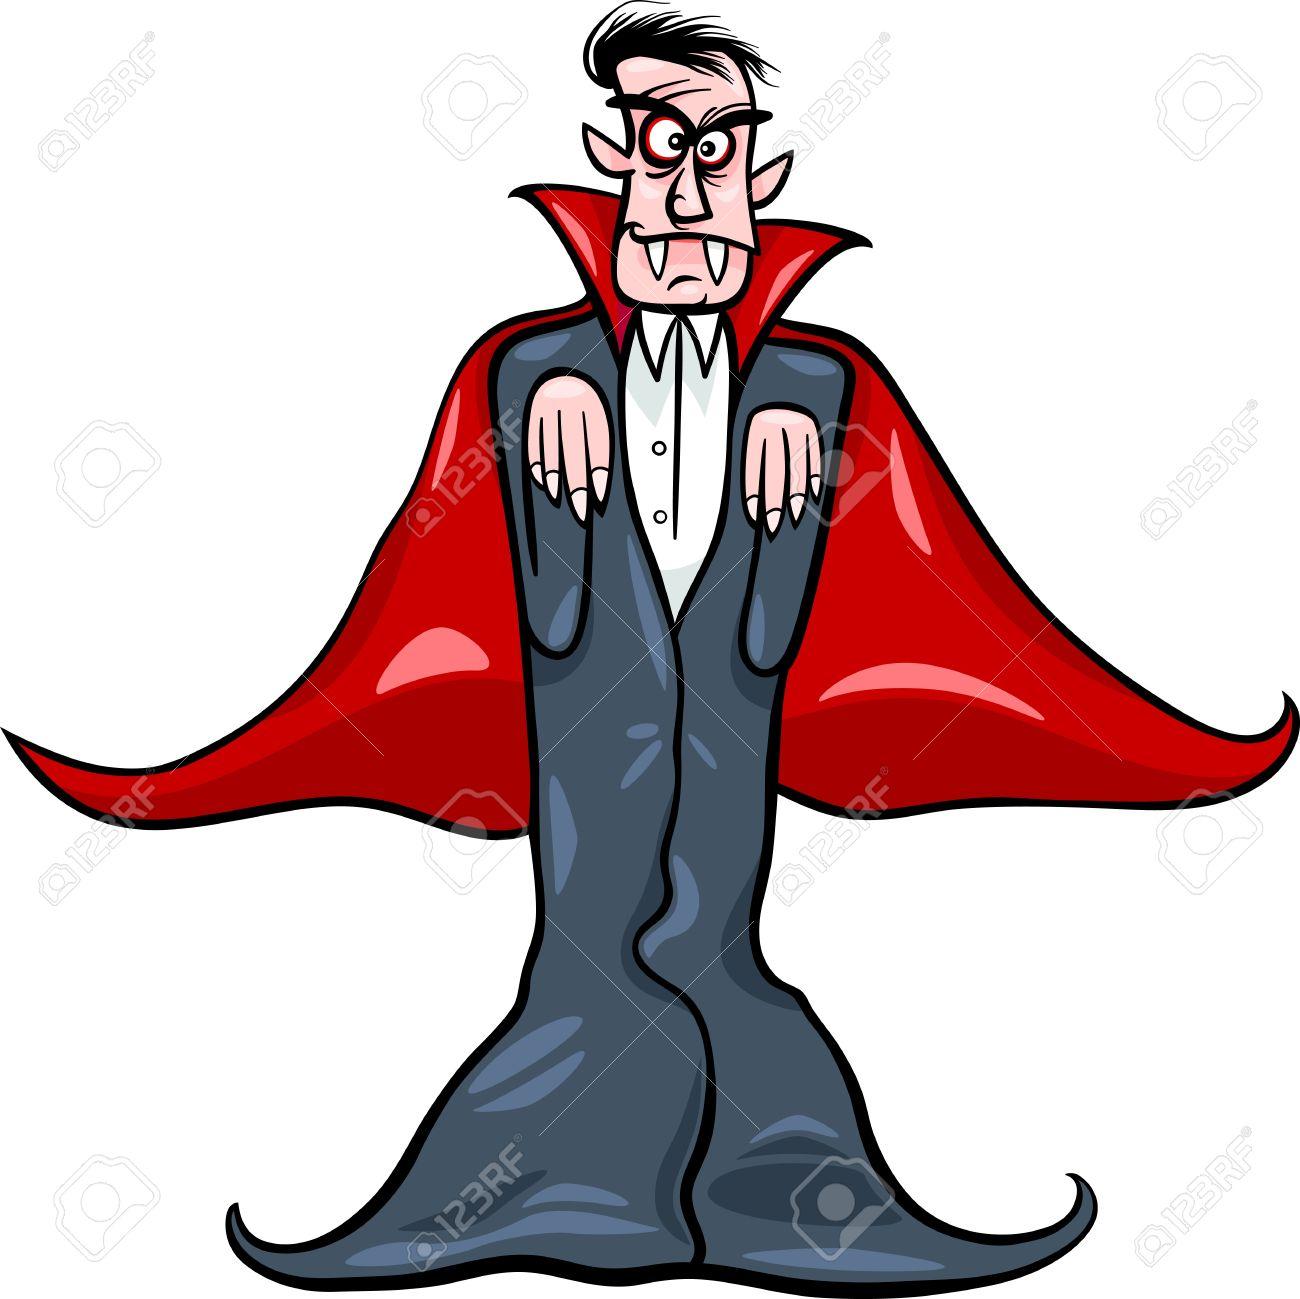 1300x1299 Cartoon Illustration Of Scary Count Dracula Vampire Royalty Free